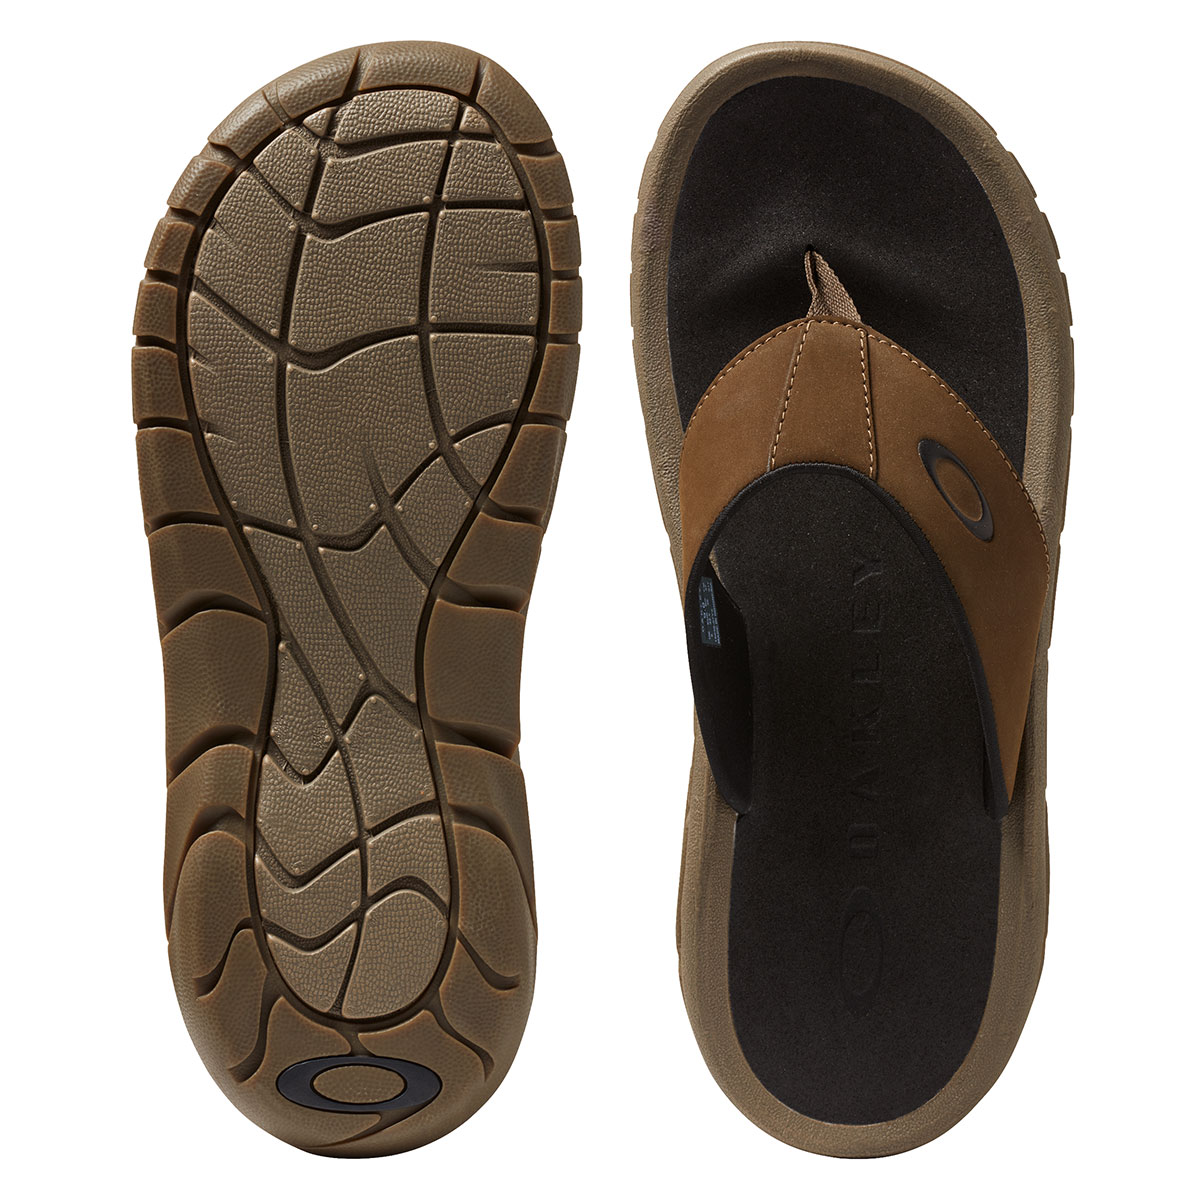 Oakley-Mens-2019-Super-Coil-Sandal-2-0-Flip-Flops-30-OFF-RRP thumbnail 5